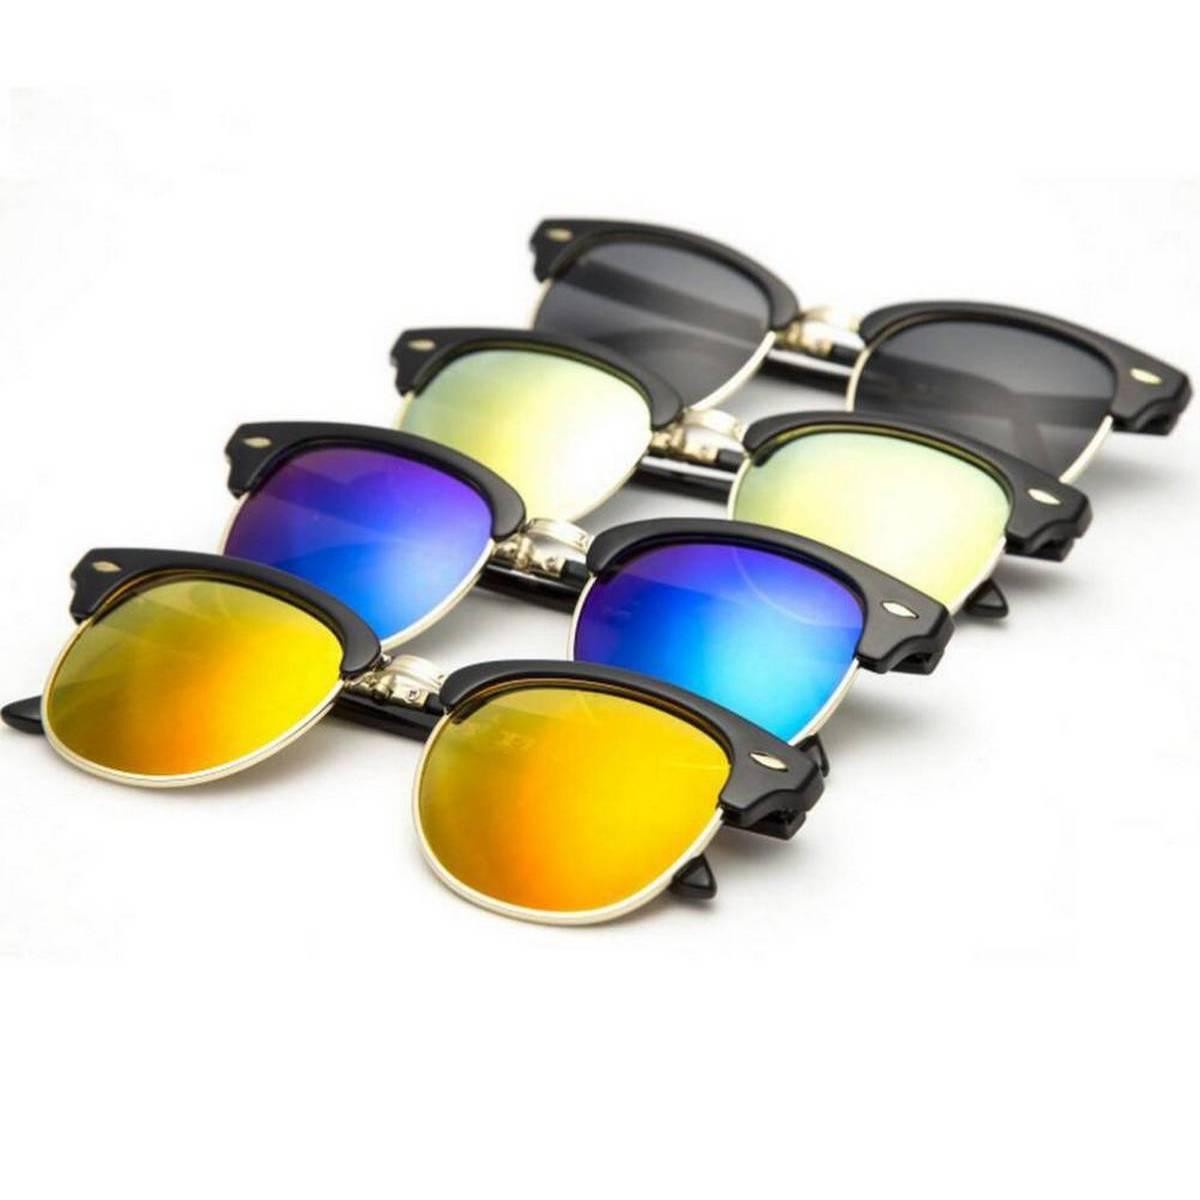 2019 High quality women fashion trendy sunglasses big large ladies quay festival sun glasses